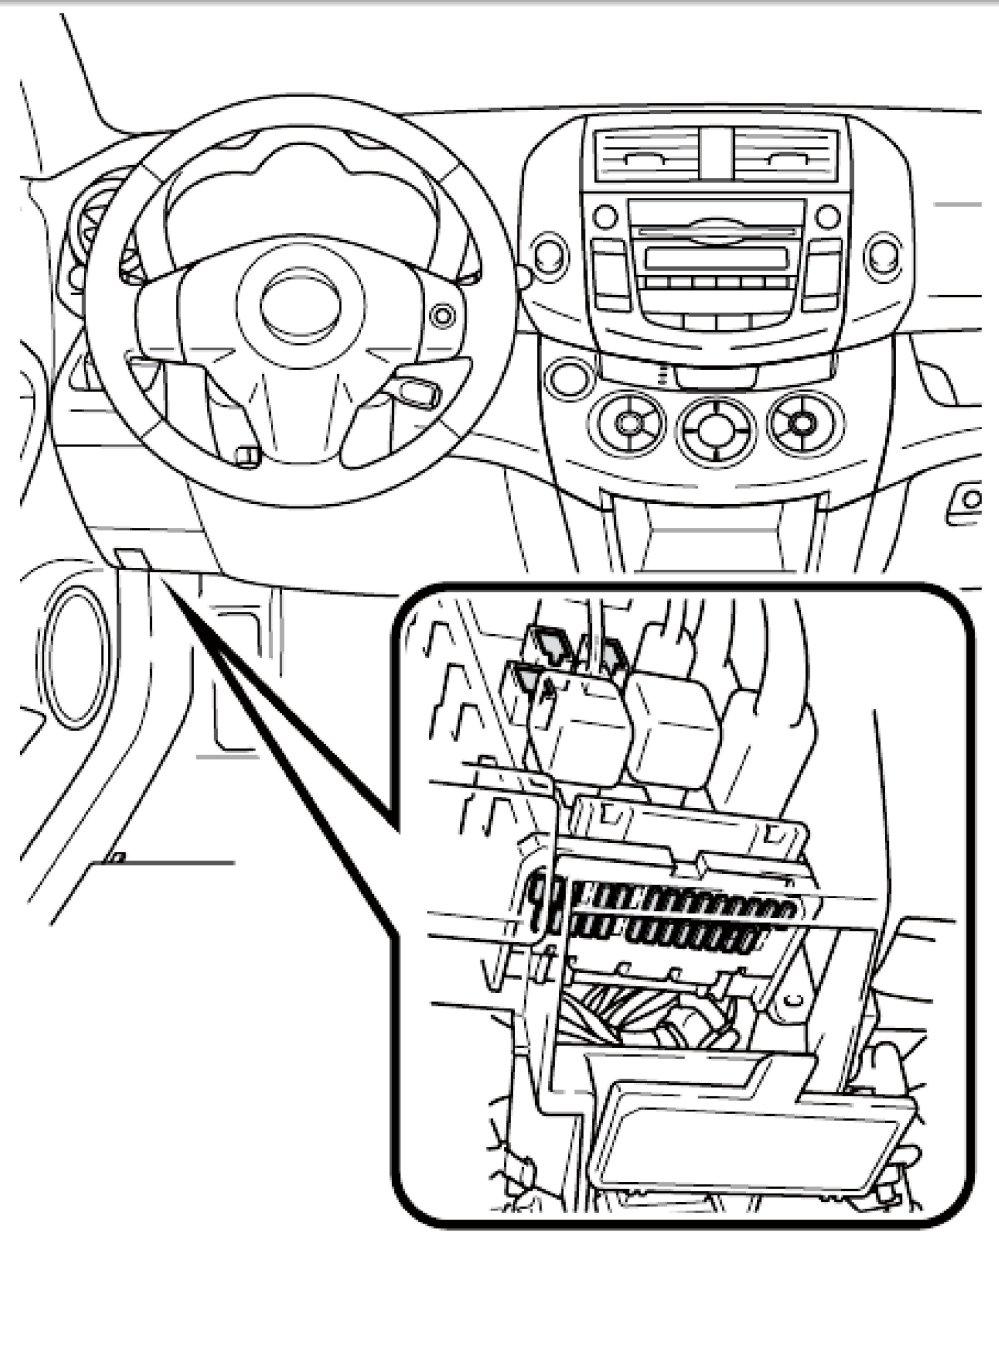 medium resolution of 2002 toyota corolla fuse box diagram